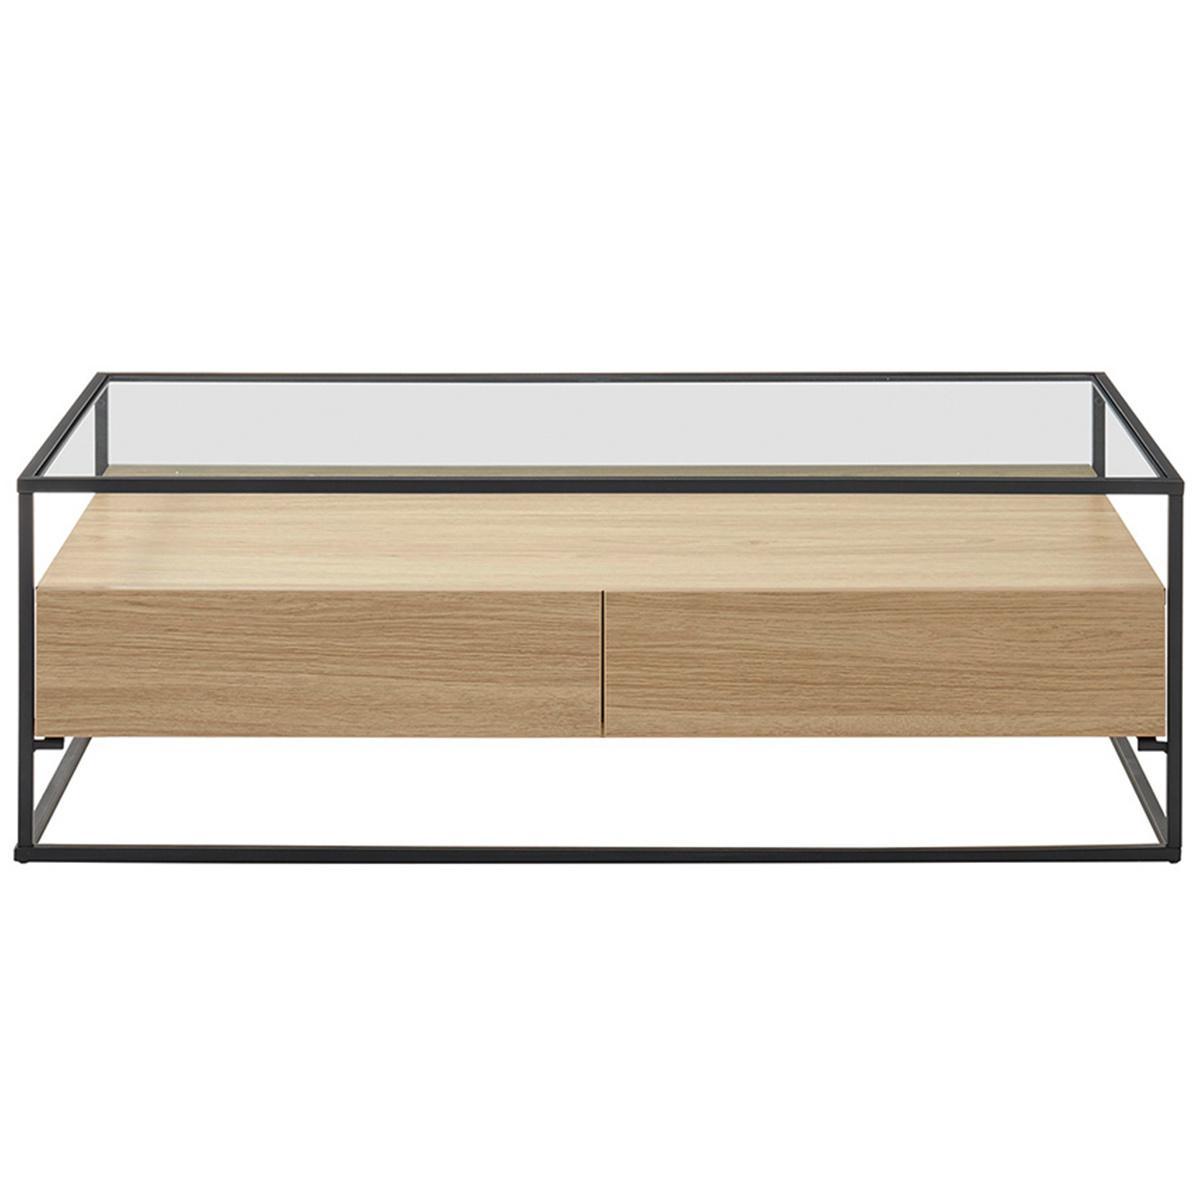 Miliboo Table basse design avec plateau verre et tiroirs bois FINN